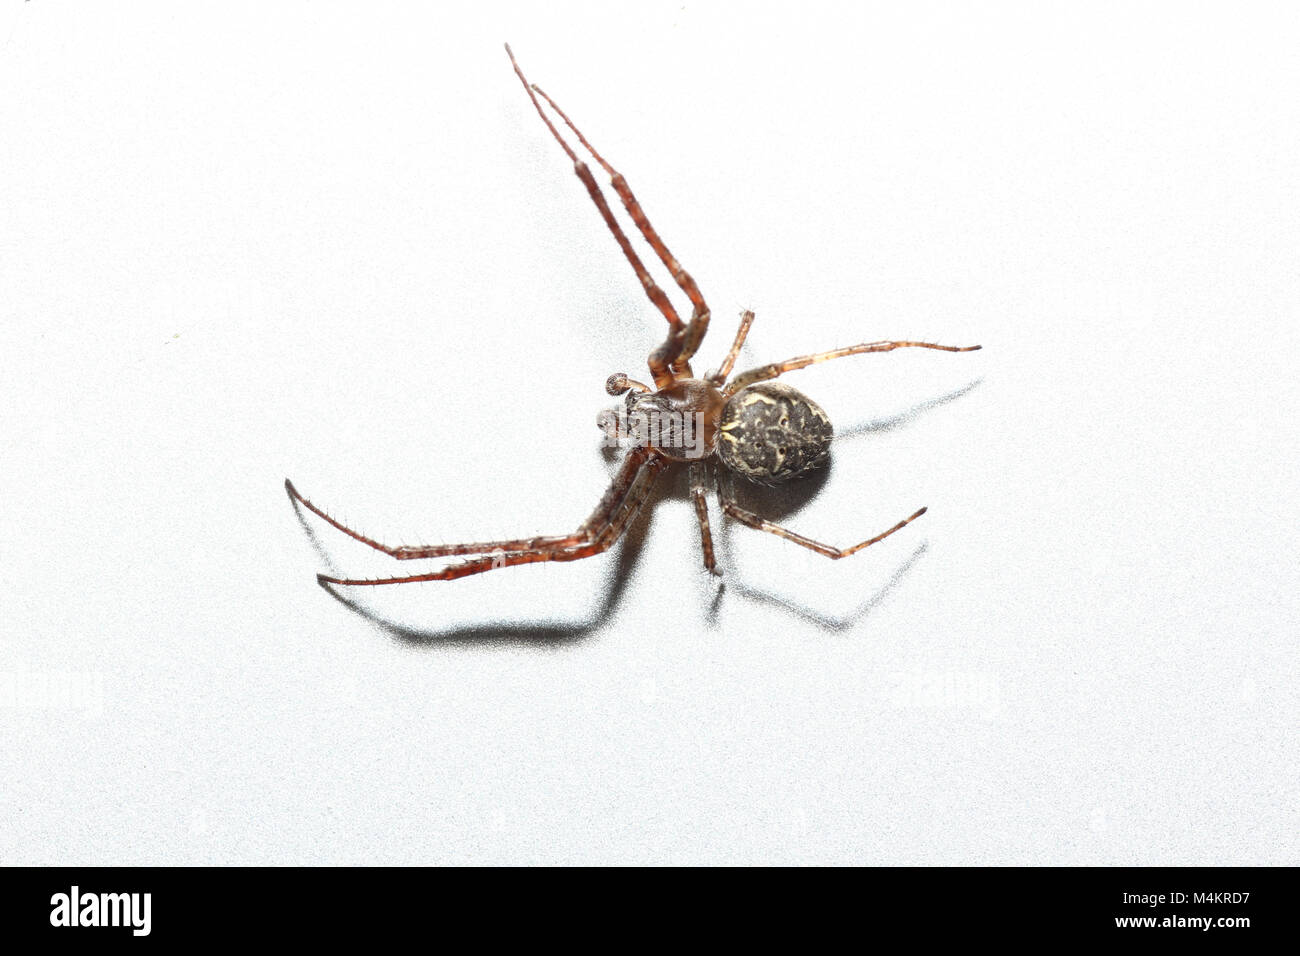 Mosquito Larvae Stock Photos & Mosquito Larvae Stock Images - Alamy